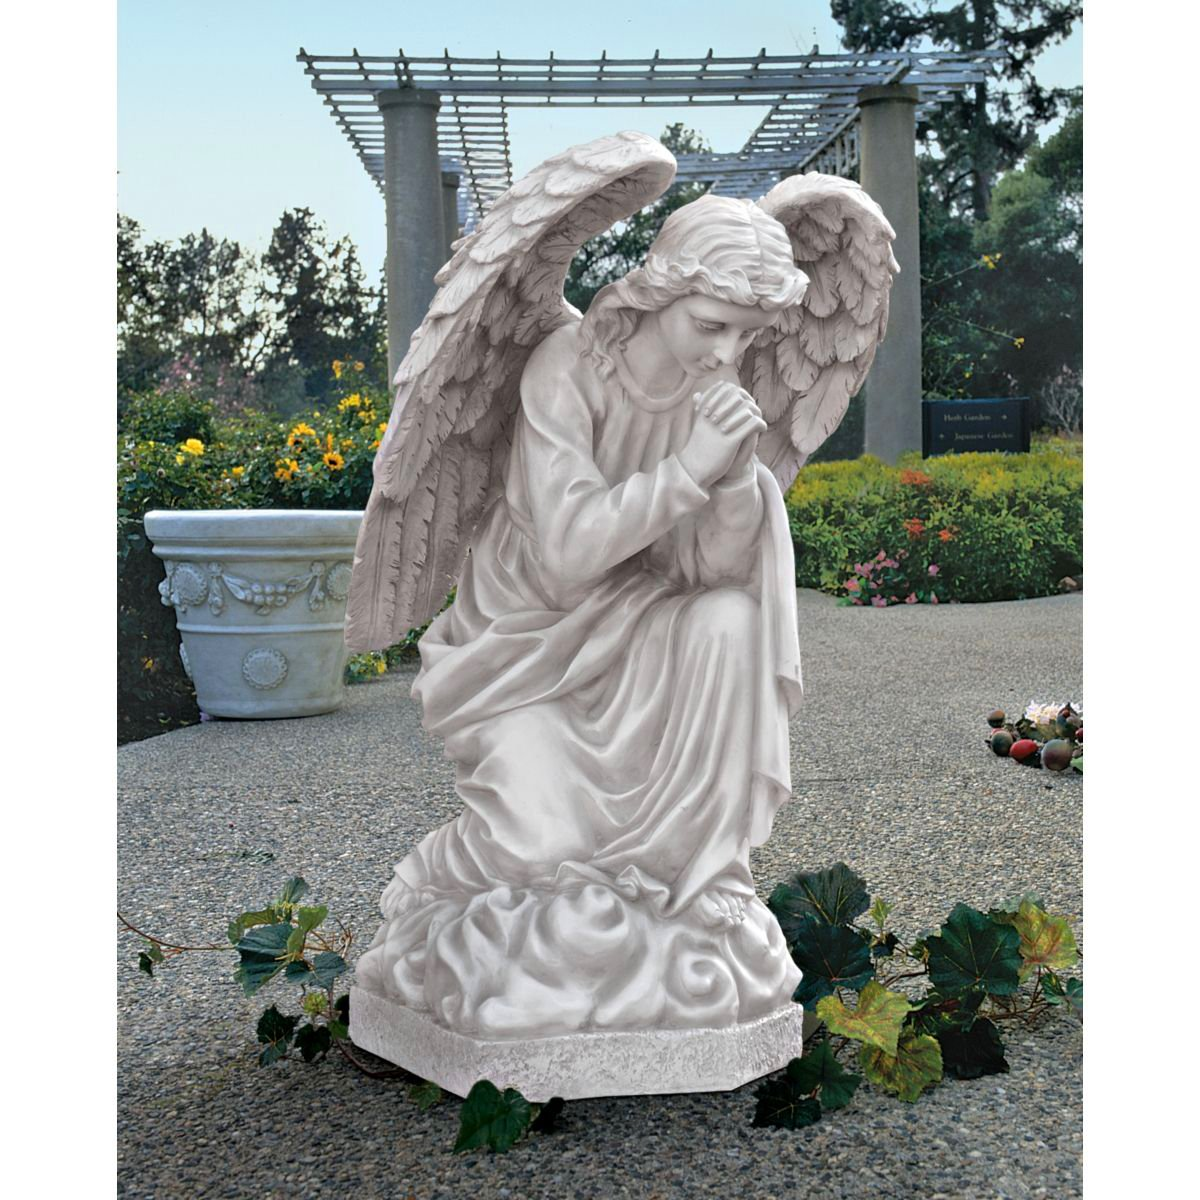 Design Toscano The Praying Basilica Angel Statue